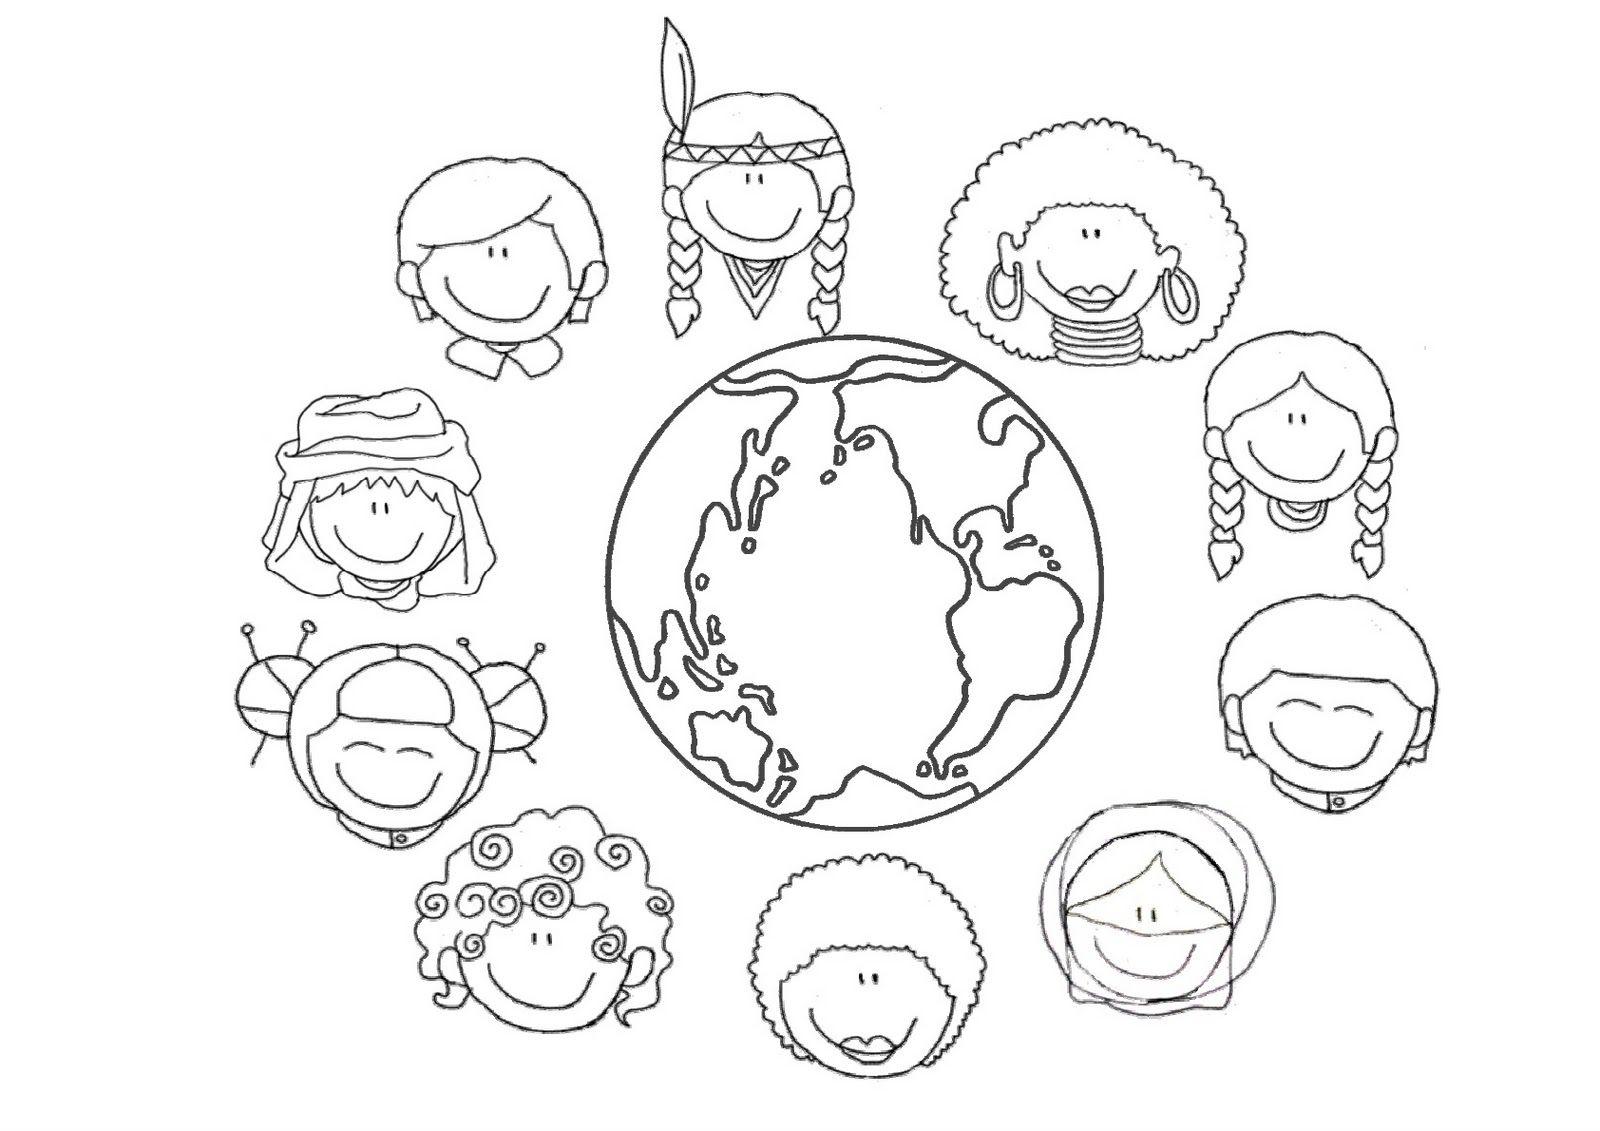 Pin De Arely Rodriguez Astorga En Preescolar 24 Octubre Dia De La Cultura Mundo Para Colorear Dibujos Para Preescolar